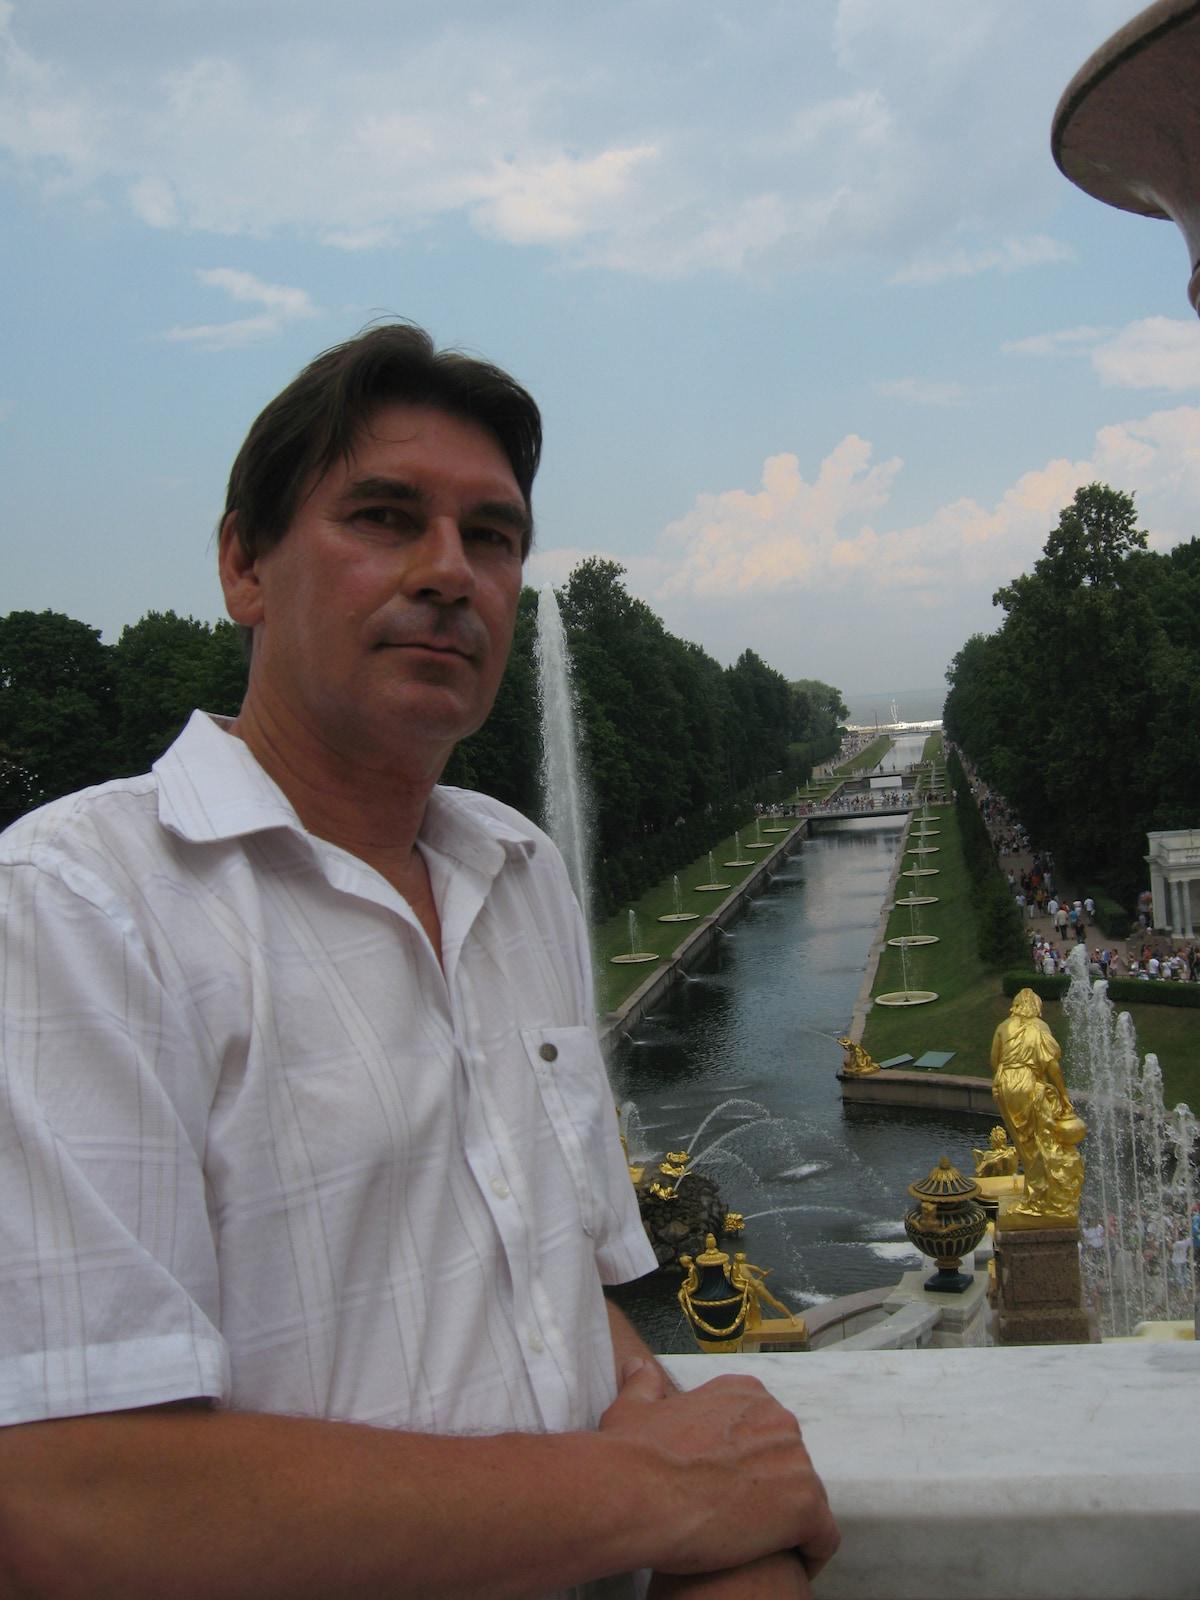 Bernard from Vincennes